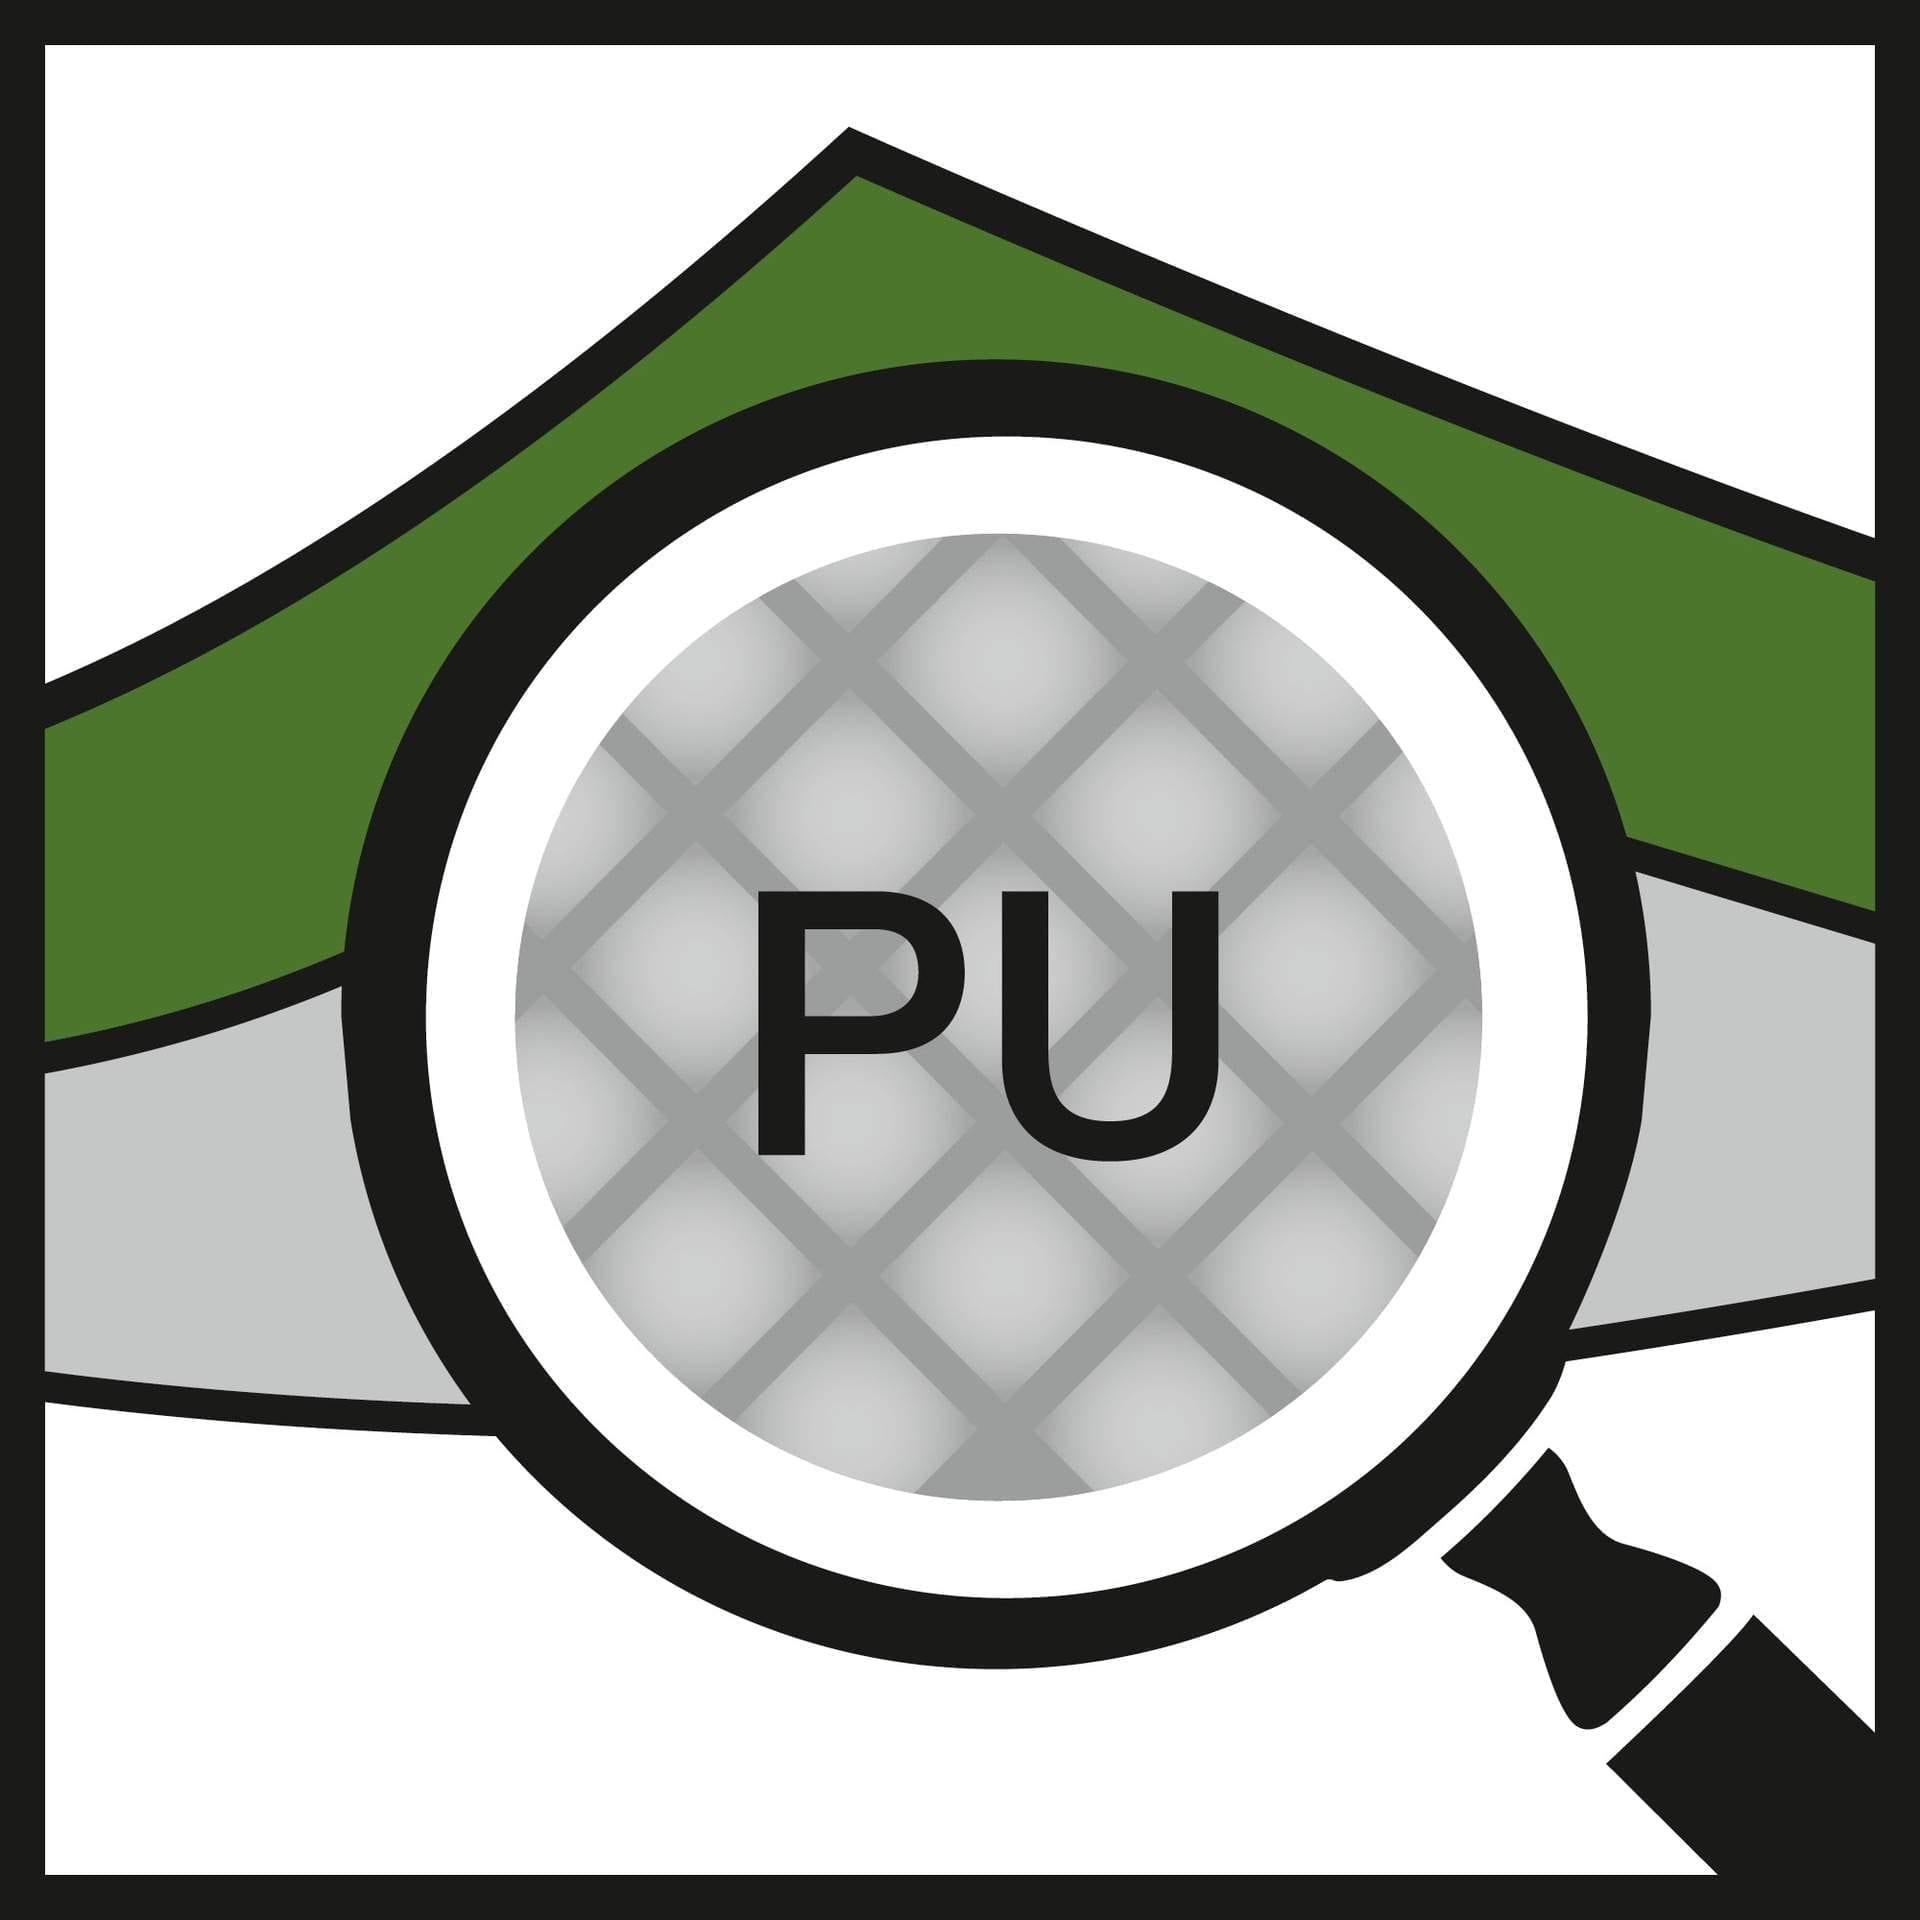 polycoatheader pu icon 2000x2000px